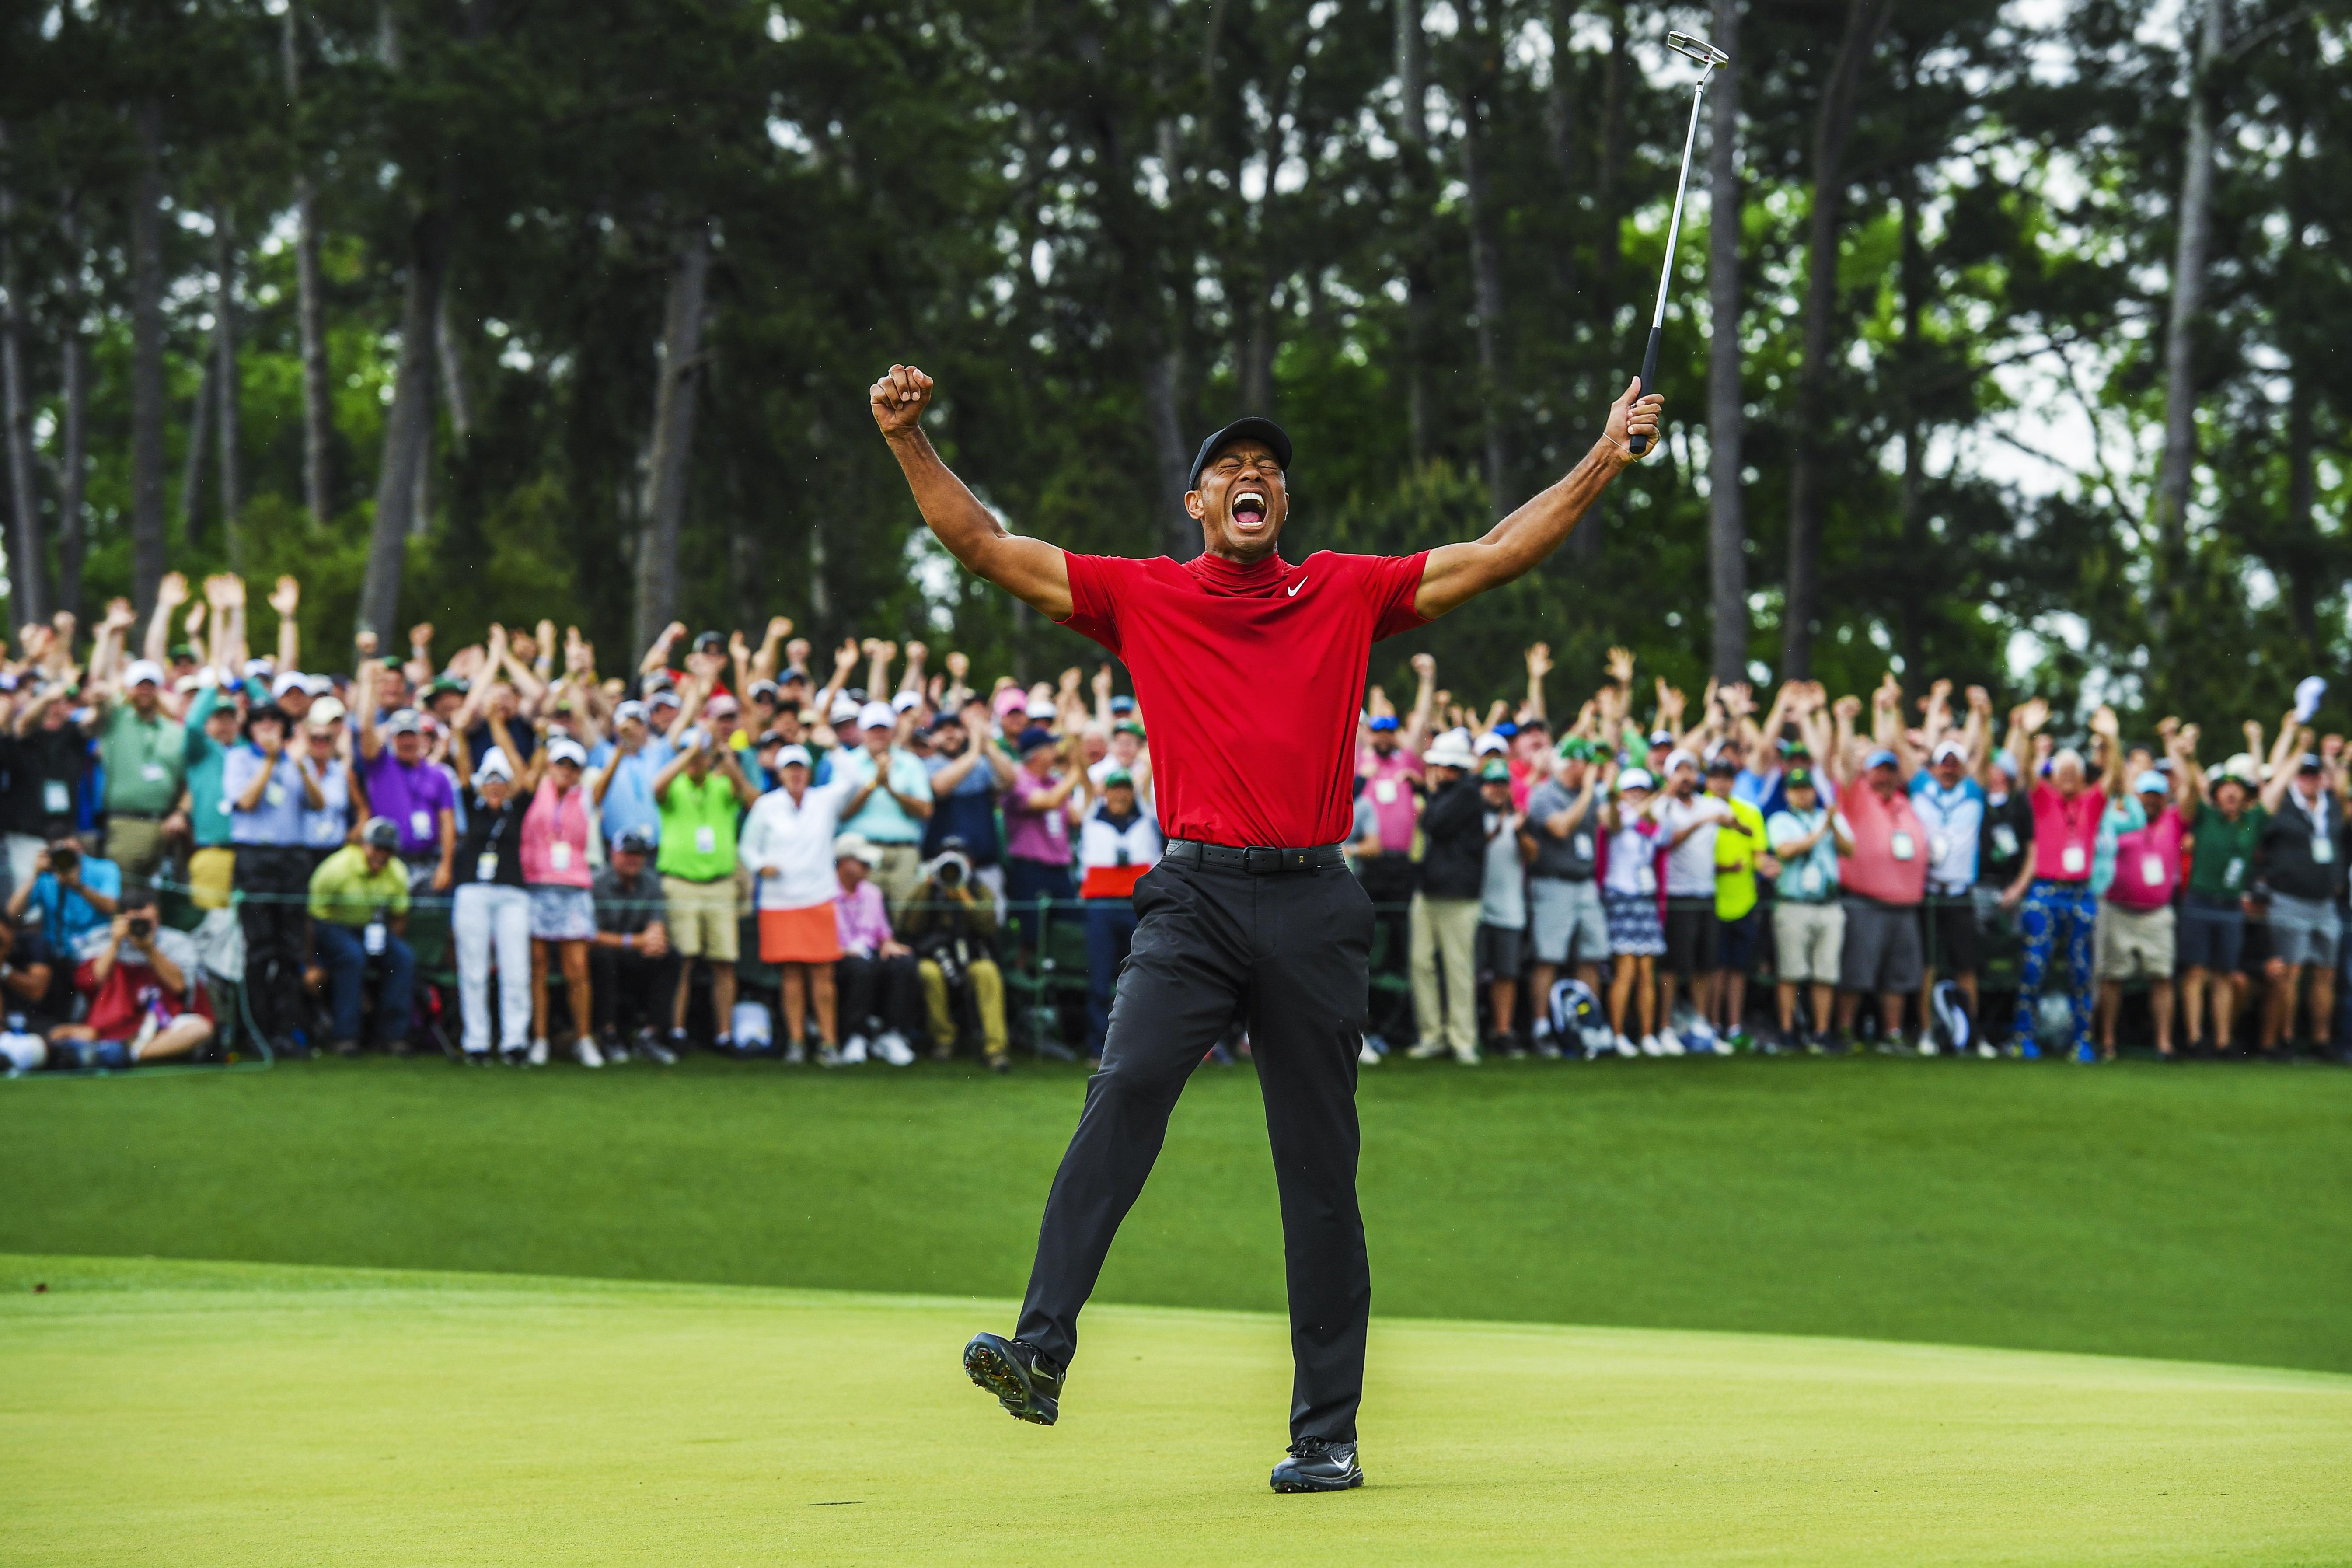 Never Say Never The Story Behind Tiger Woods Magical Fifth Masters Victory Golf World Golf Digest Проверьте подключение к интернету и перезагрузите страницу. 2